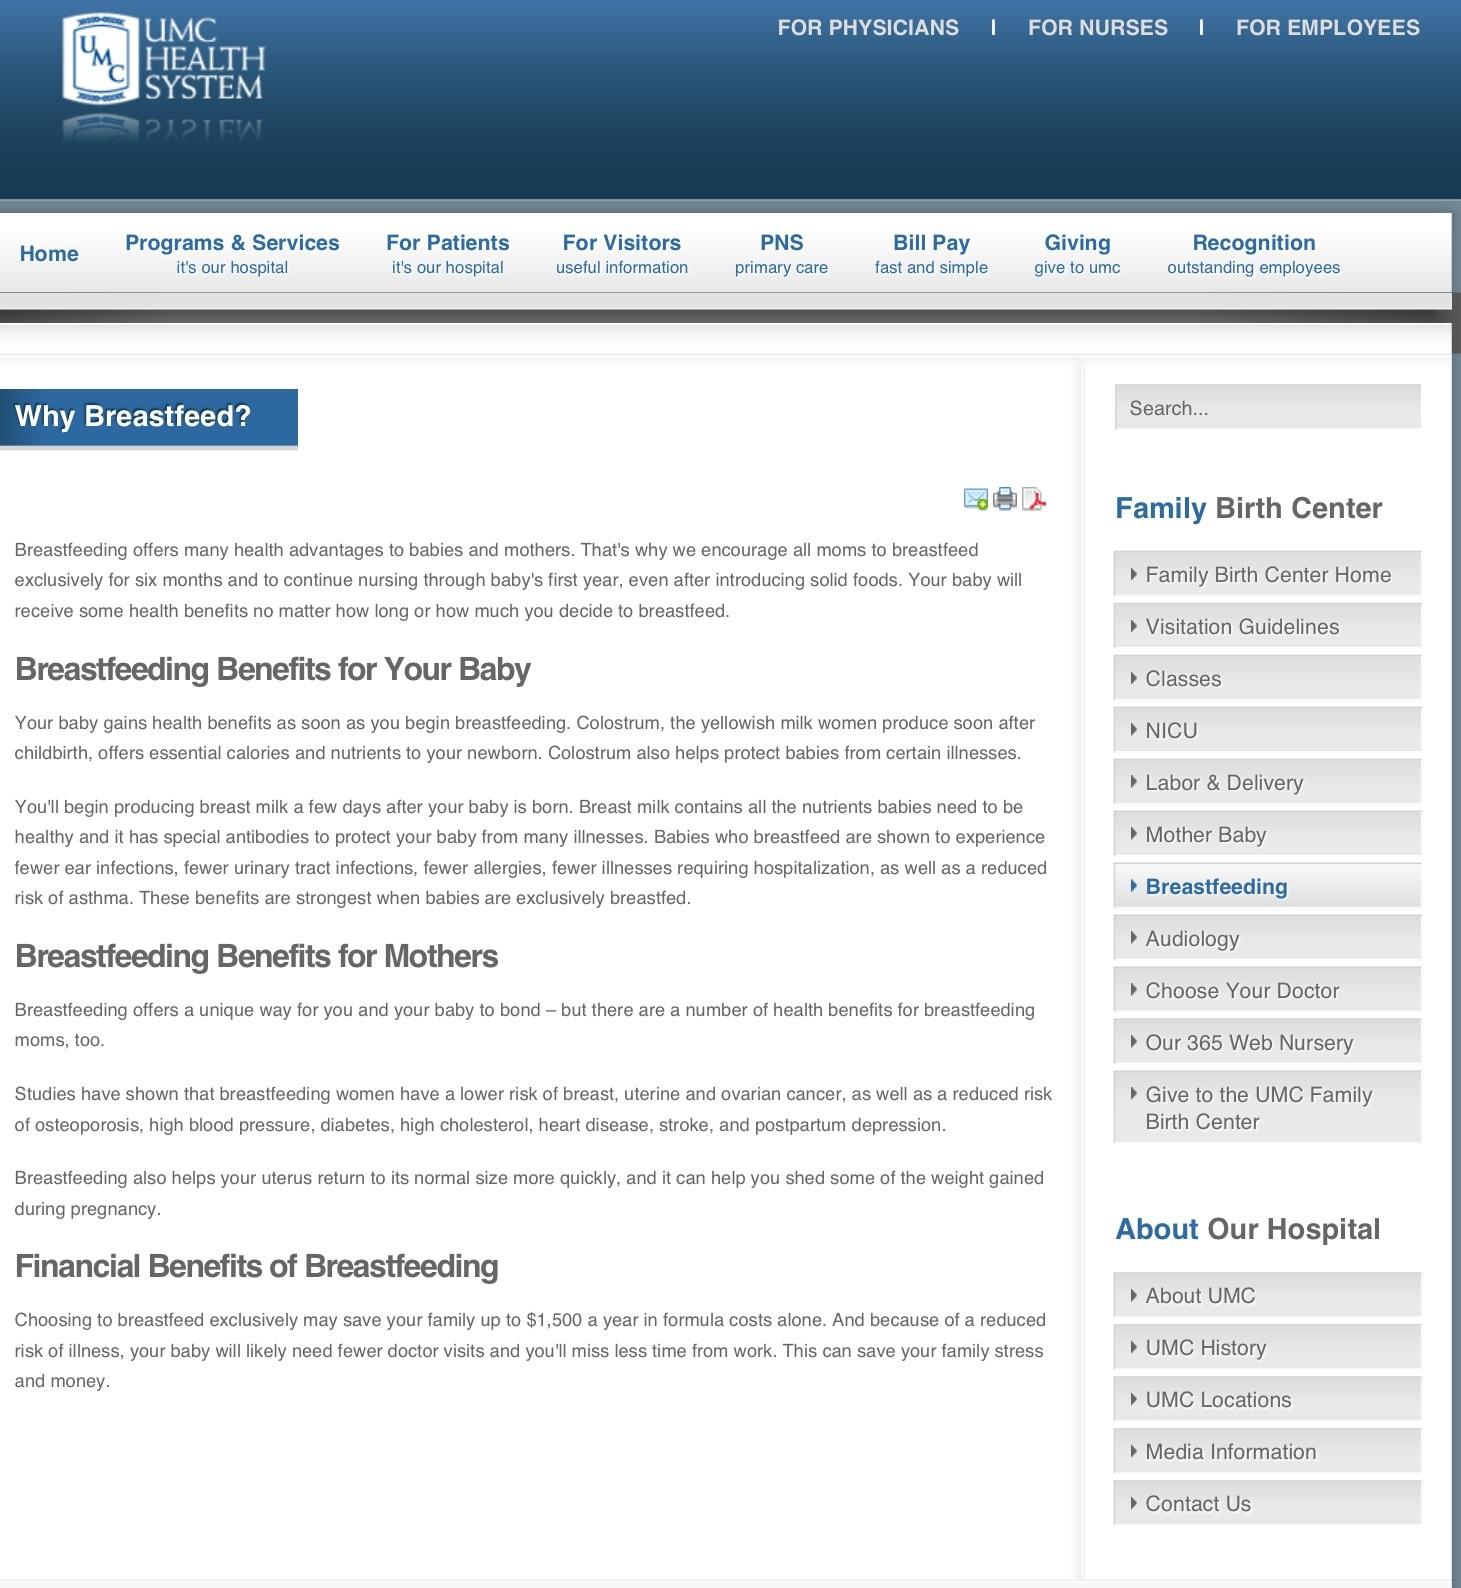 UMC Family Birth Center web page